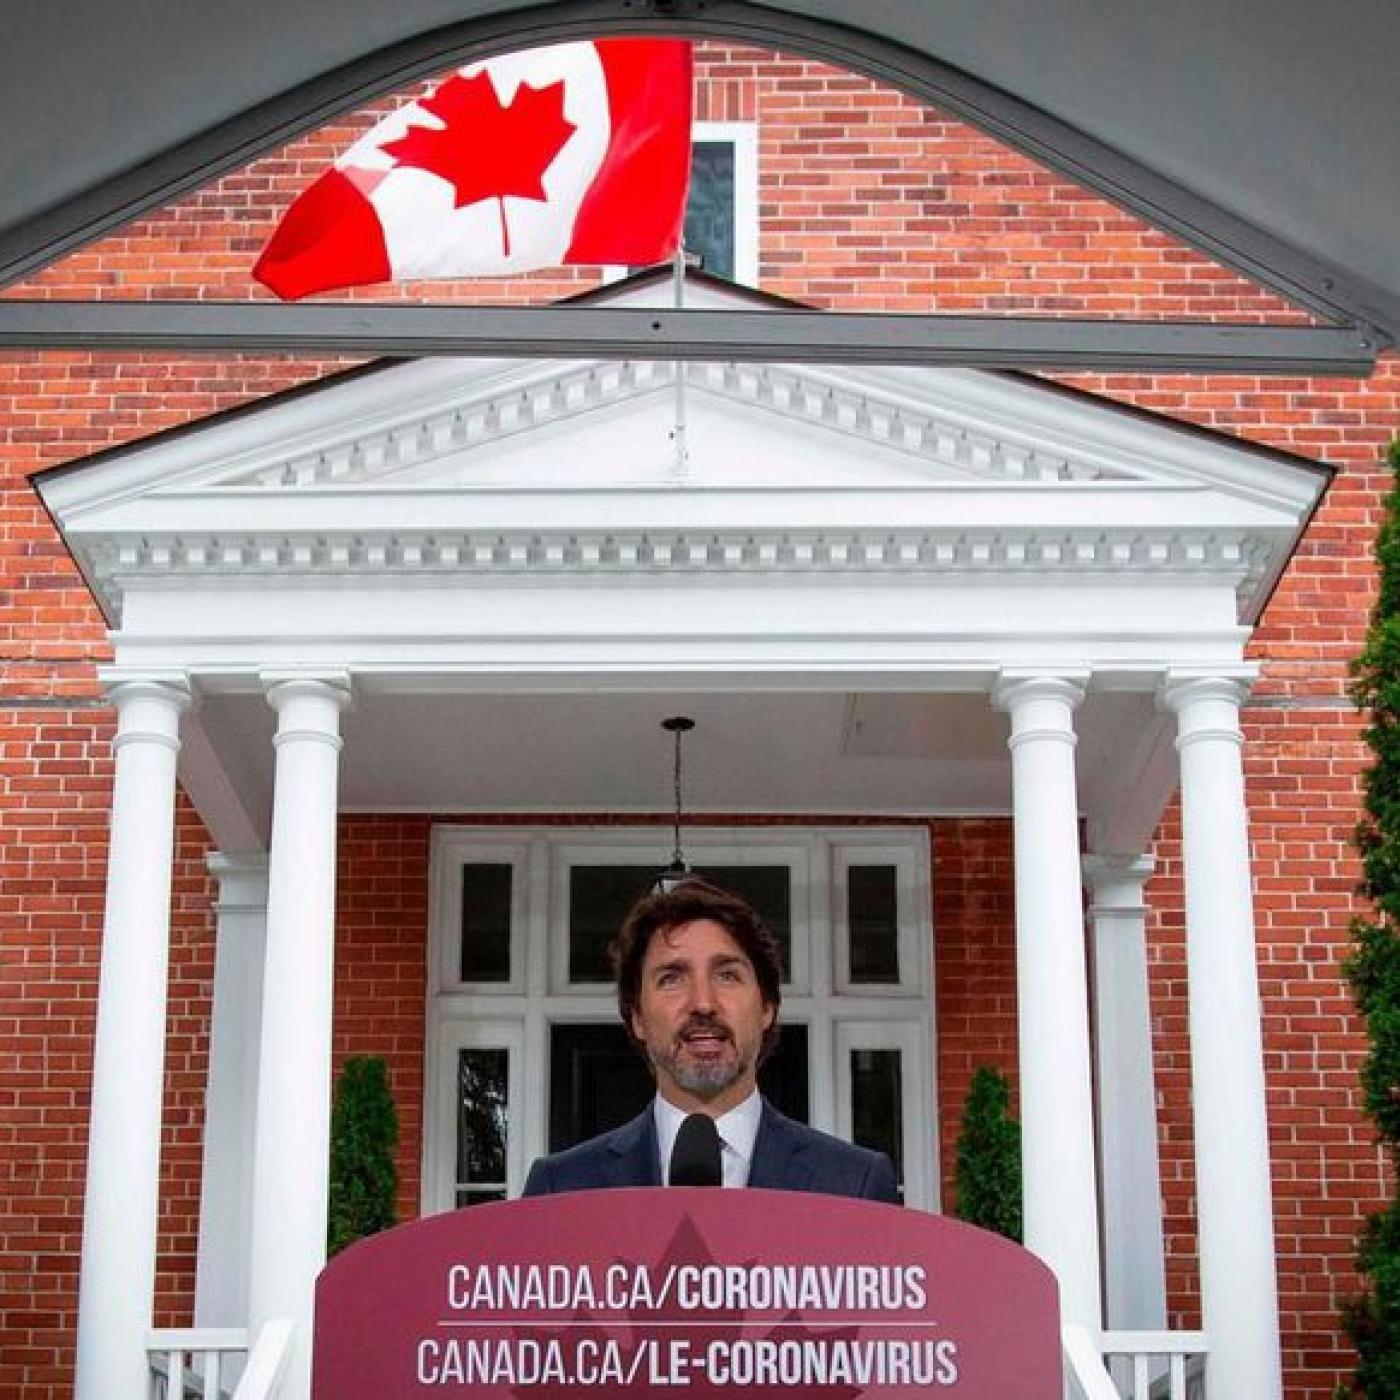 La 2nd vague & les règles respectées au Canada - Marion a Ottawa - 09 12 2020 - StereoChic Radio